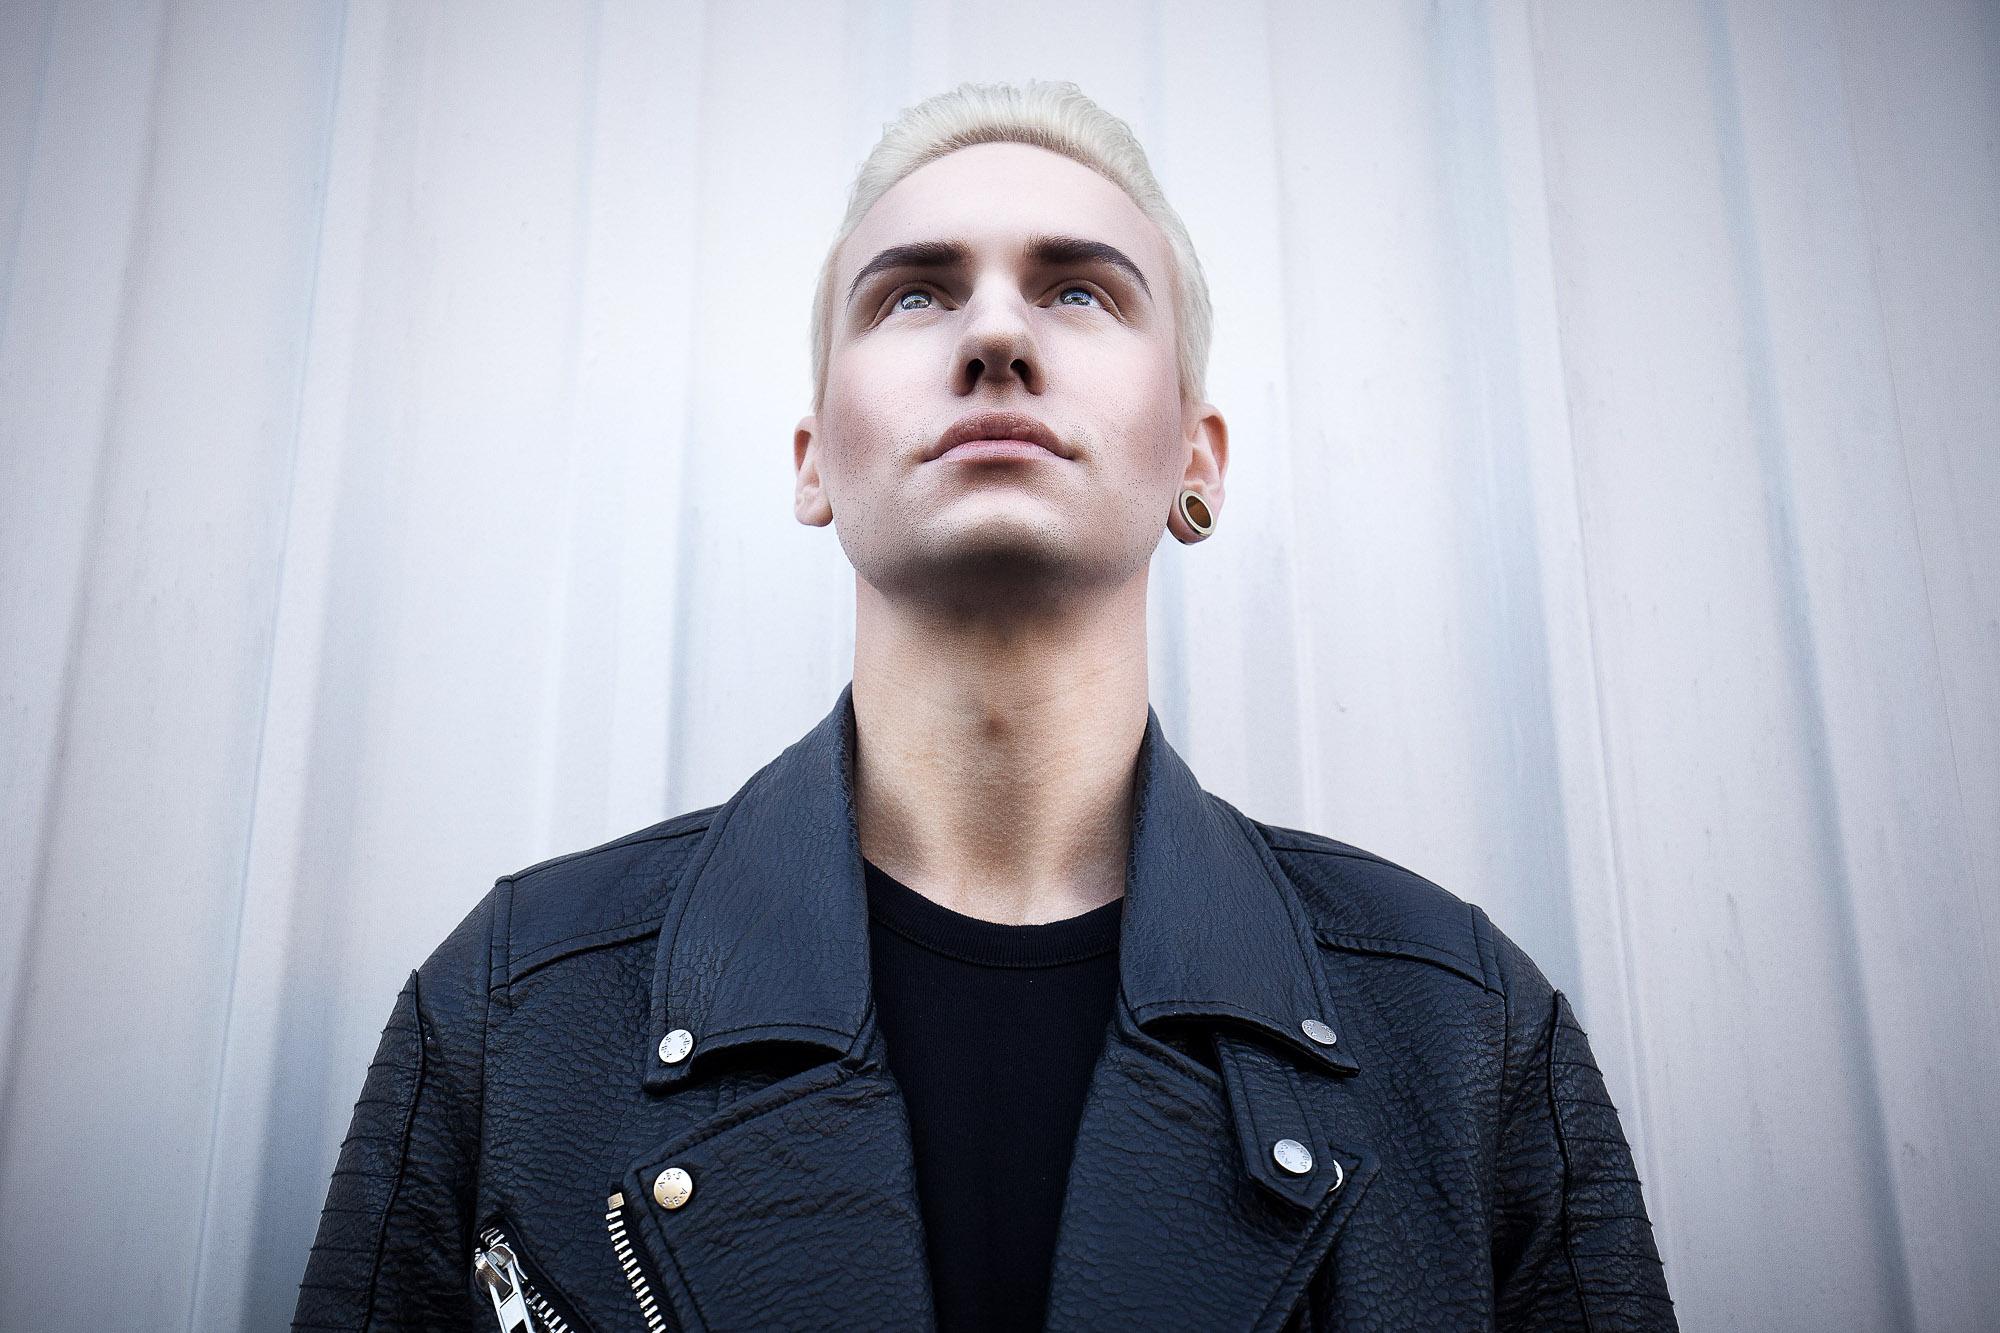 Cody Matson